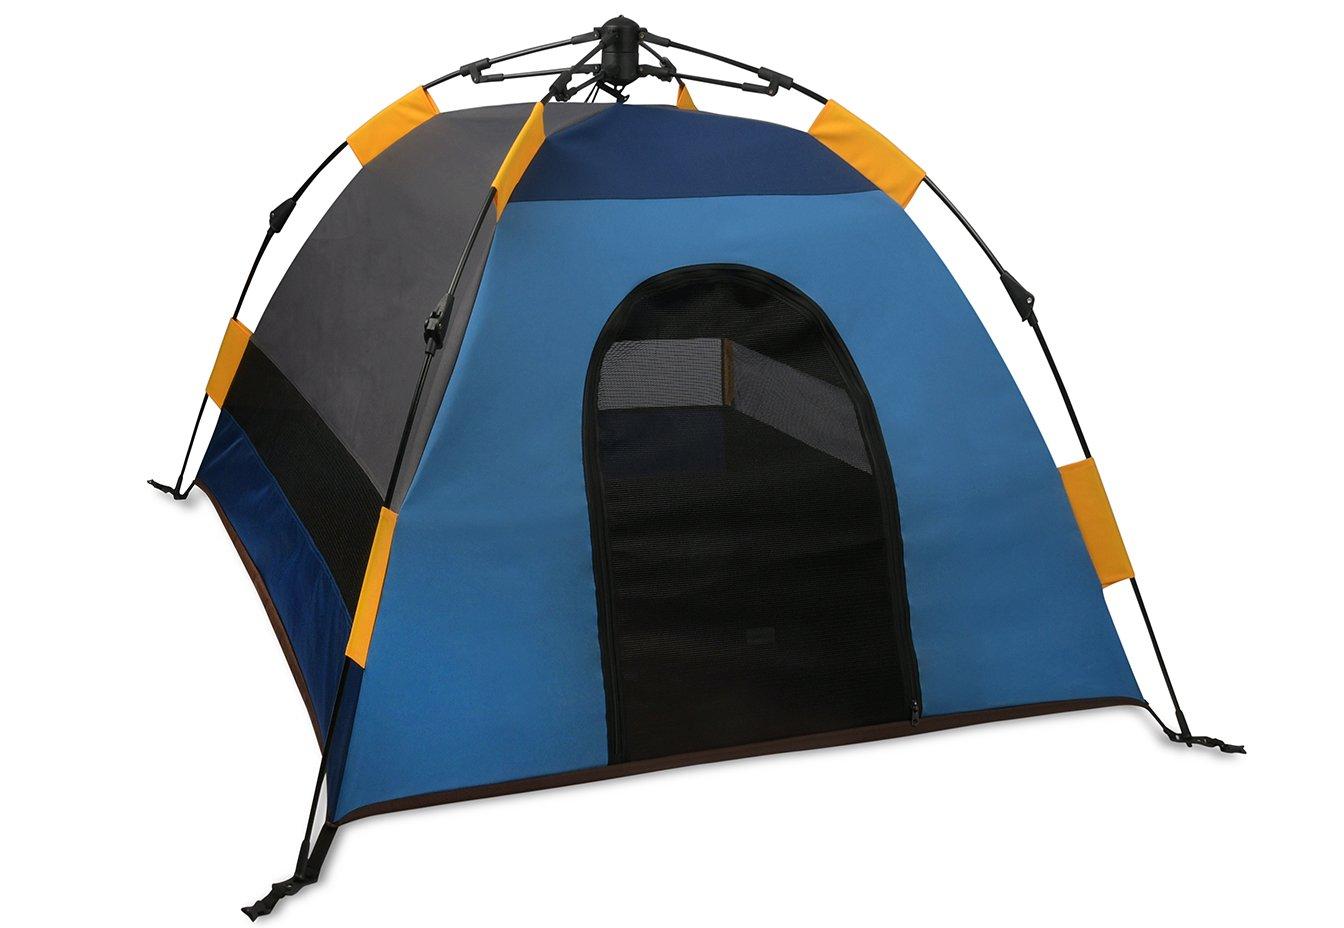 P.L.A.Y. Pop Up Tent, Blue River